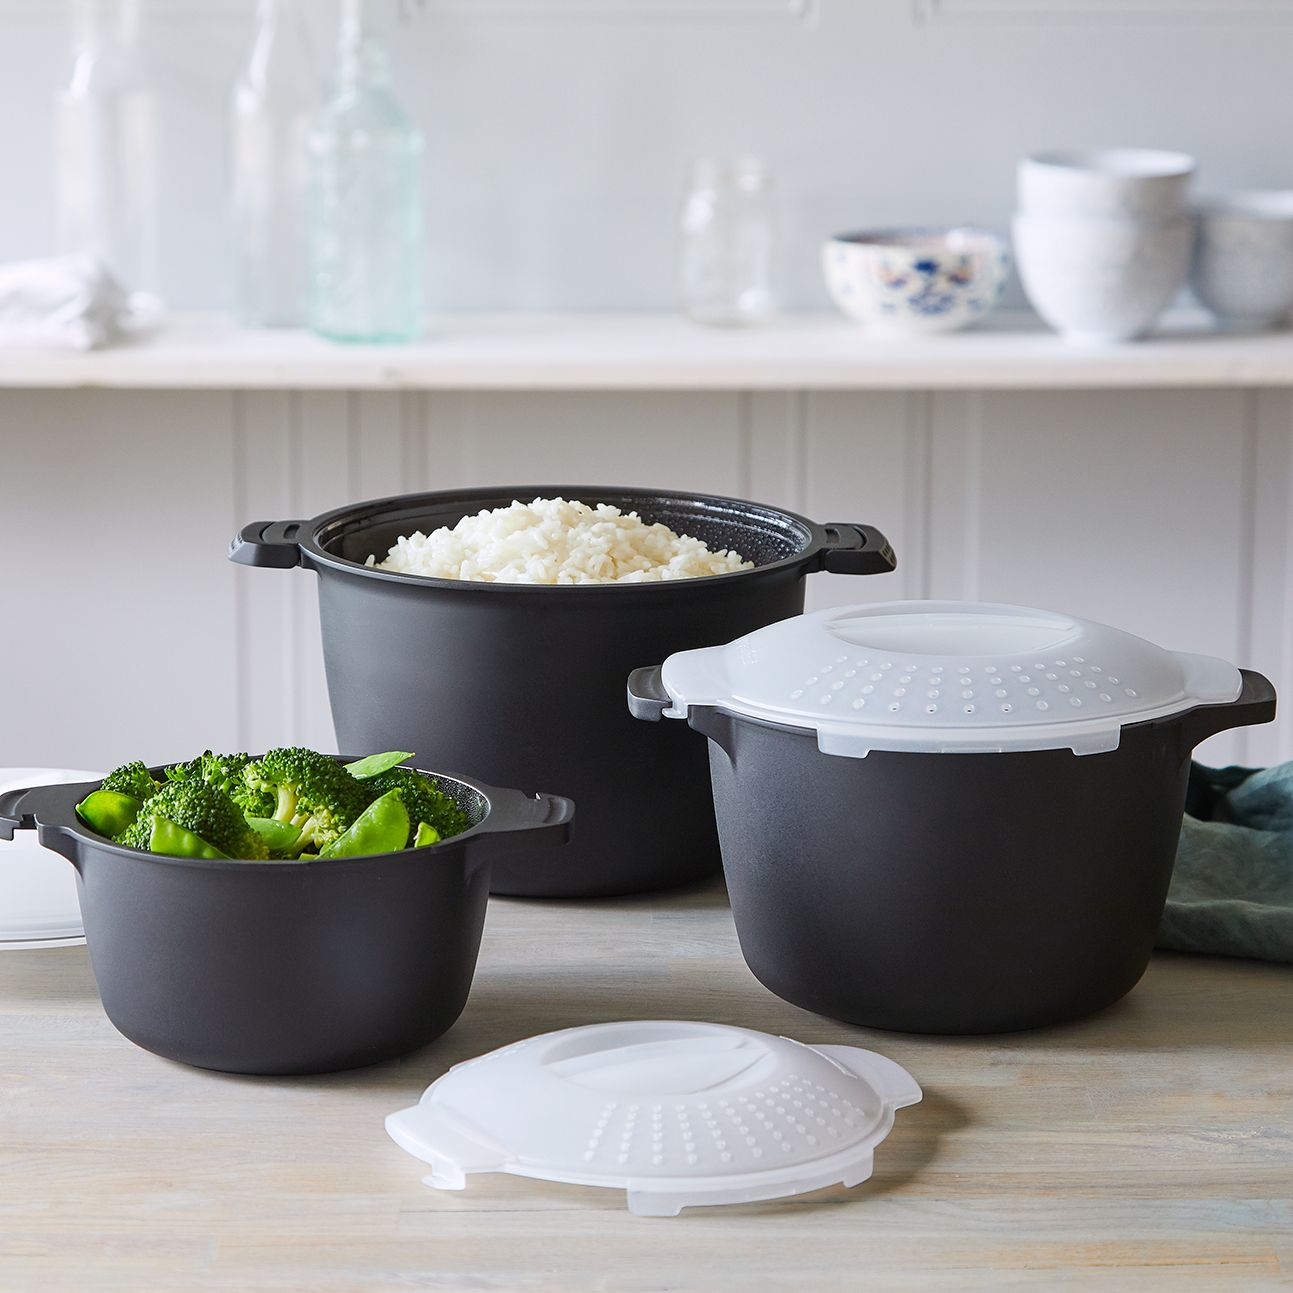 micro-cooker-set.jpg